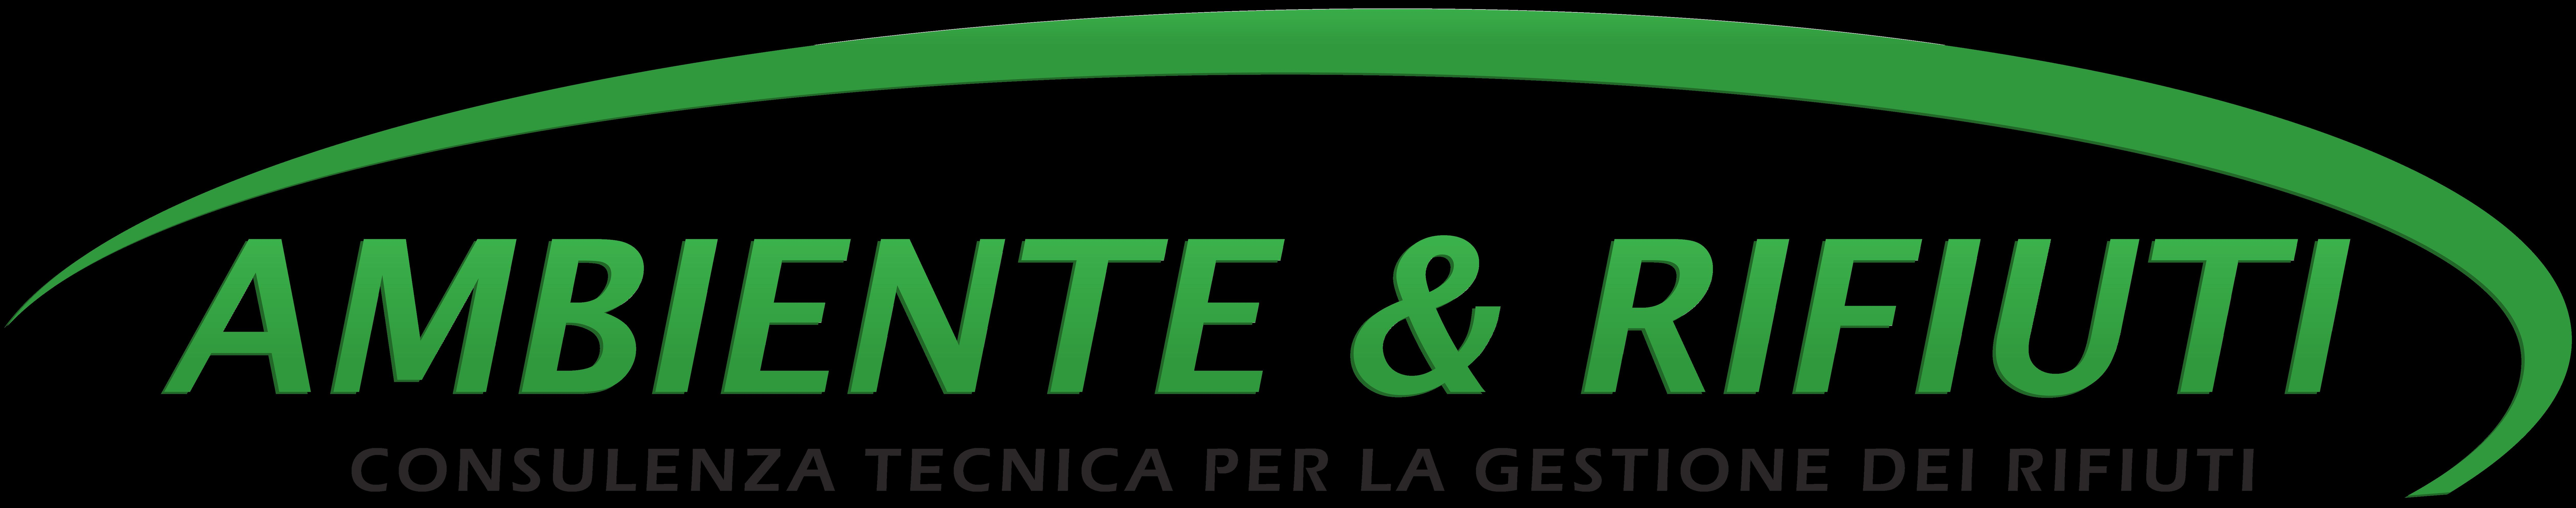 Consulenza gestione rifiuti logo